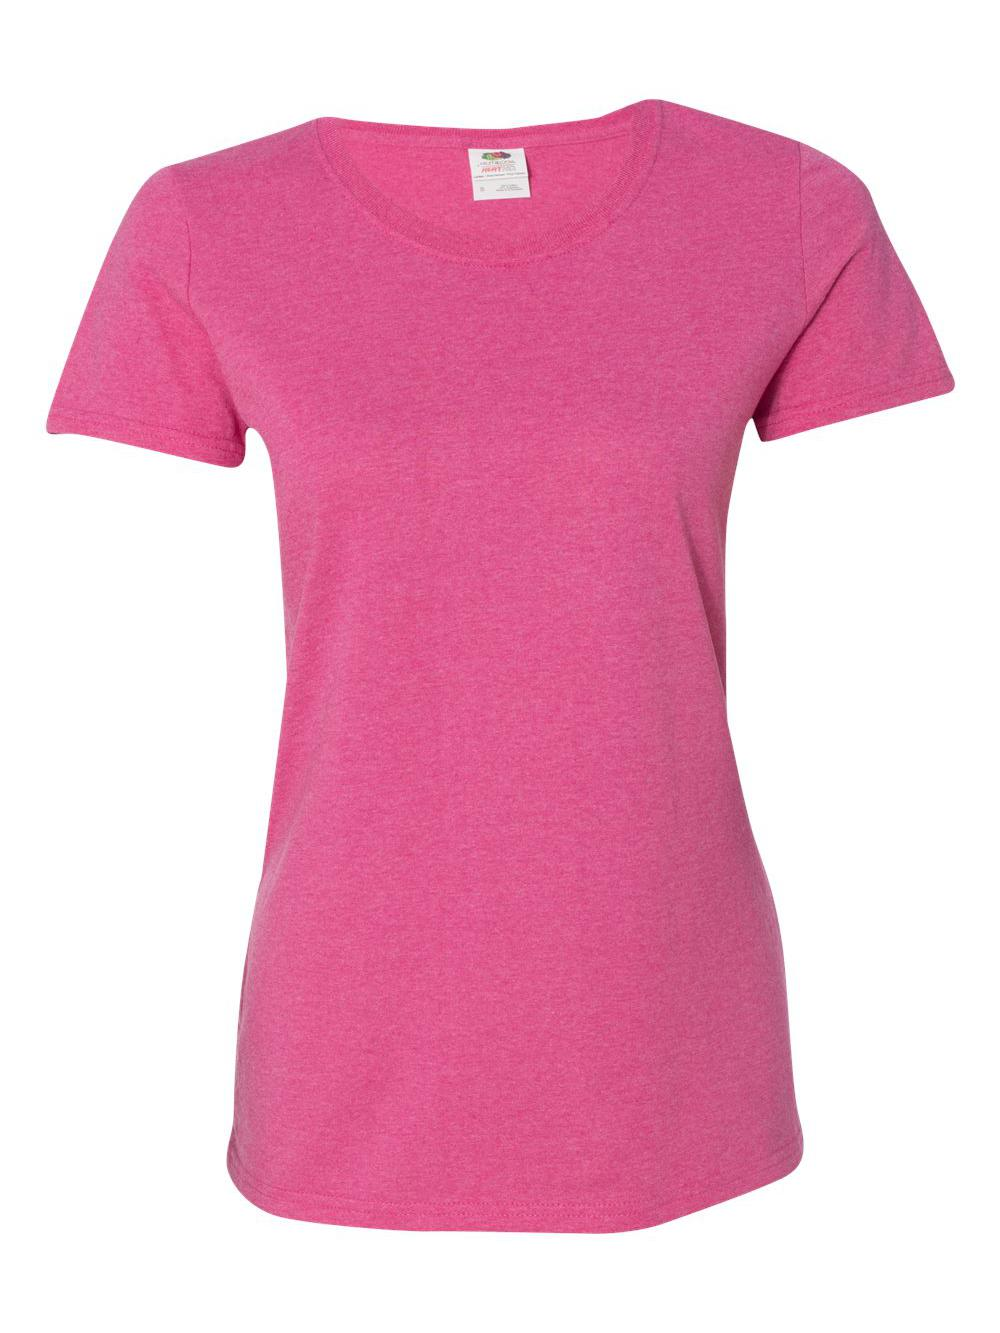 Fruit-of-the-Loom-HD-Cotton-Women-039-s-Short-Sleeve-T-Shirt-L3930R thumbnail 27